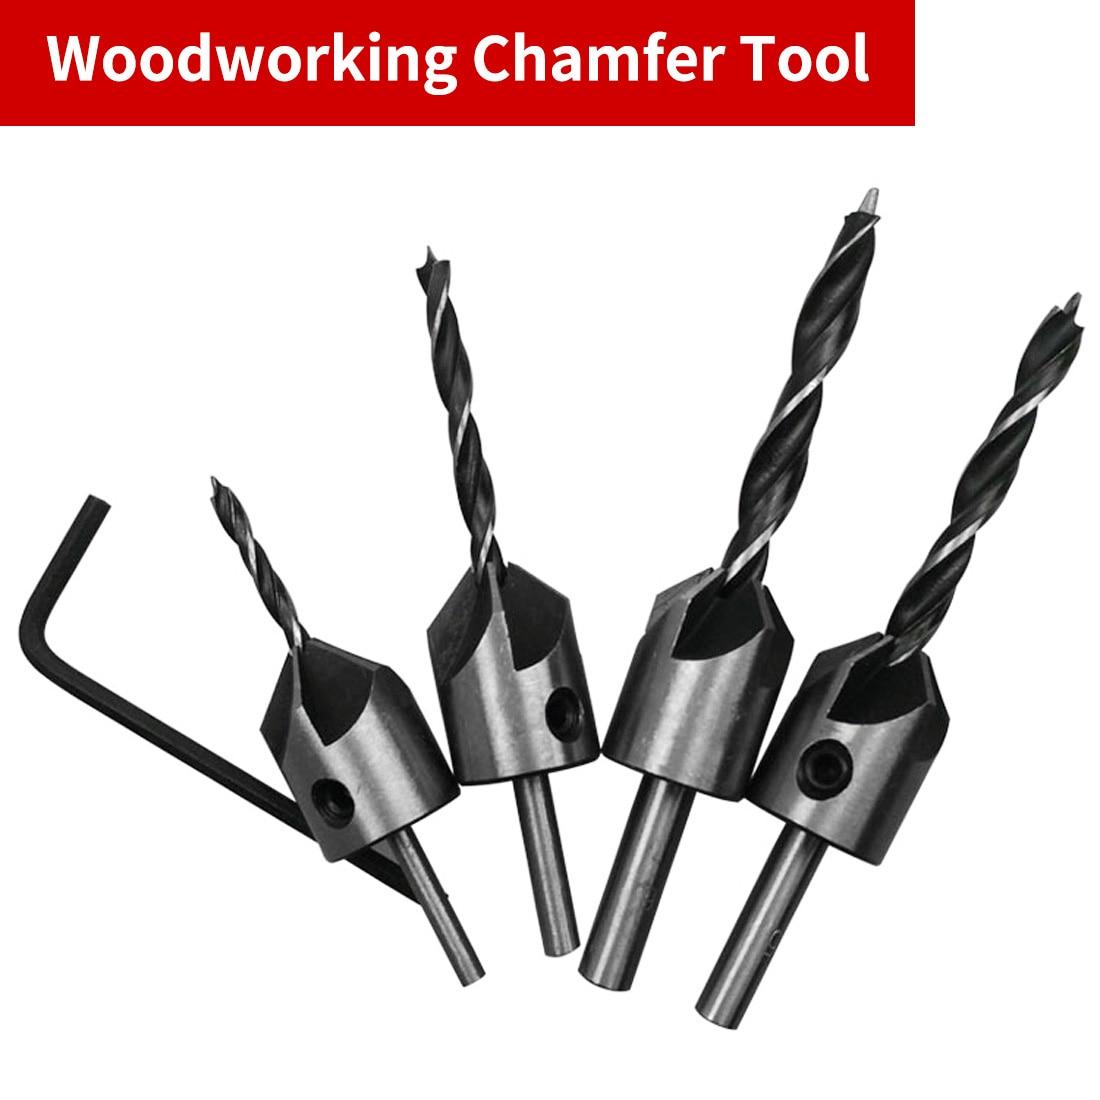 4pcs HSS 5 Flute Countersink Drill Bit Set Drill Press Set Chamfer Reamer Woodworking Power Tools 3mm 4mm 5mm 6mm